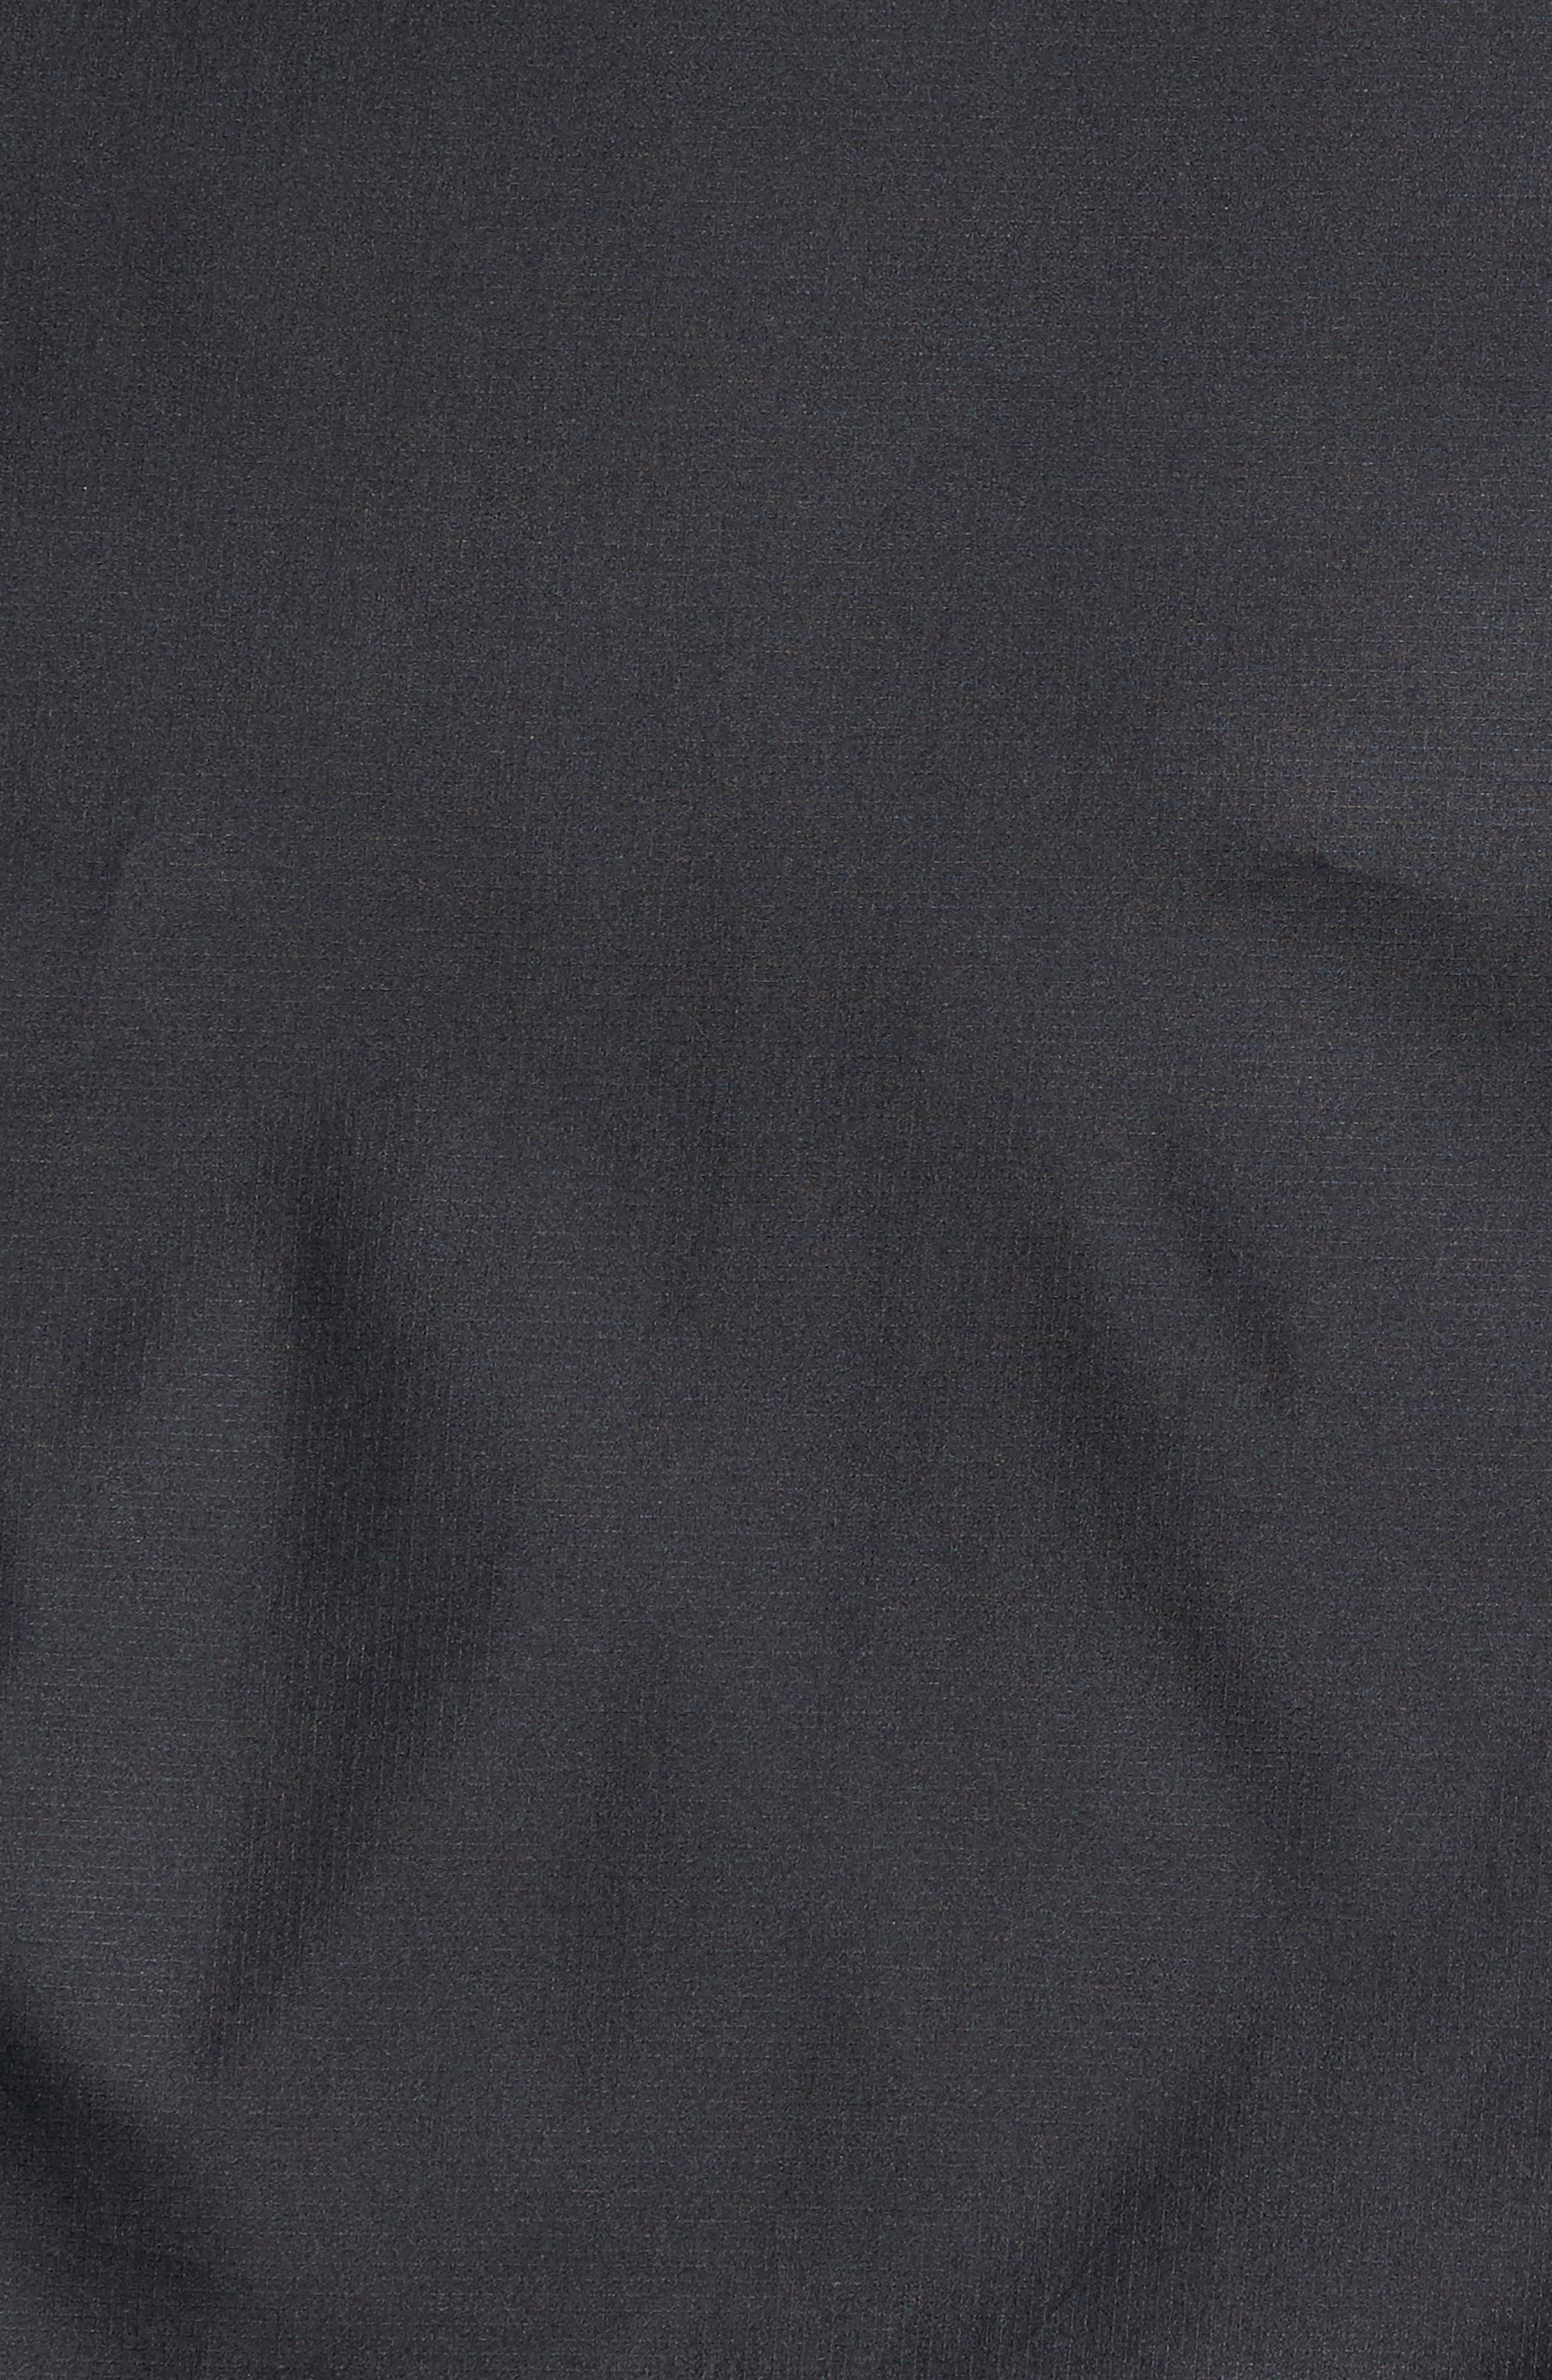 Sportstyle Reactor Reversible Bomber Jacket,                             Alternate thumbnail 5, color,                             Black / Black